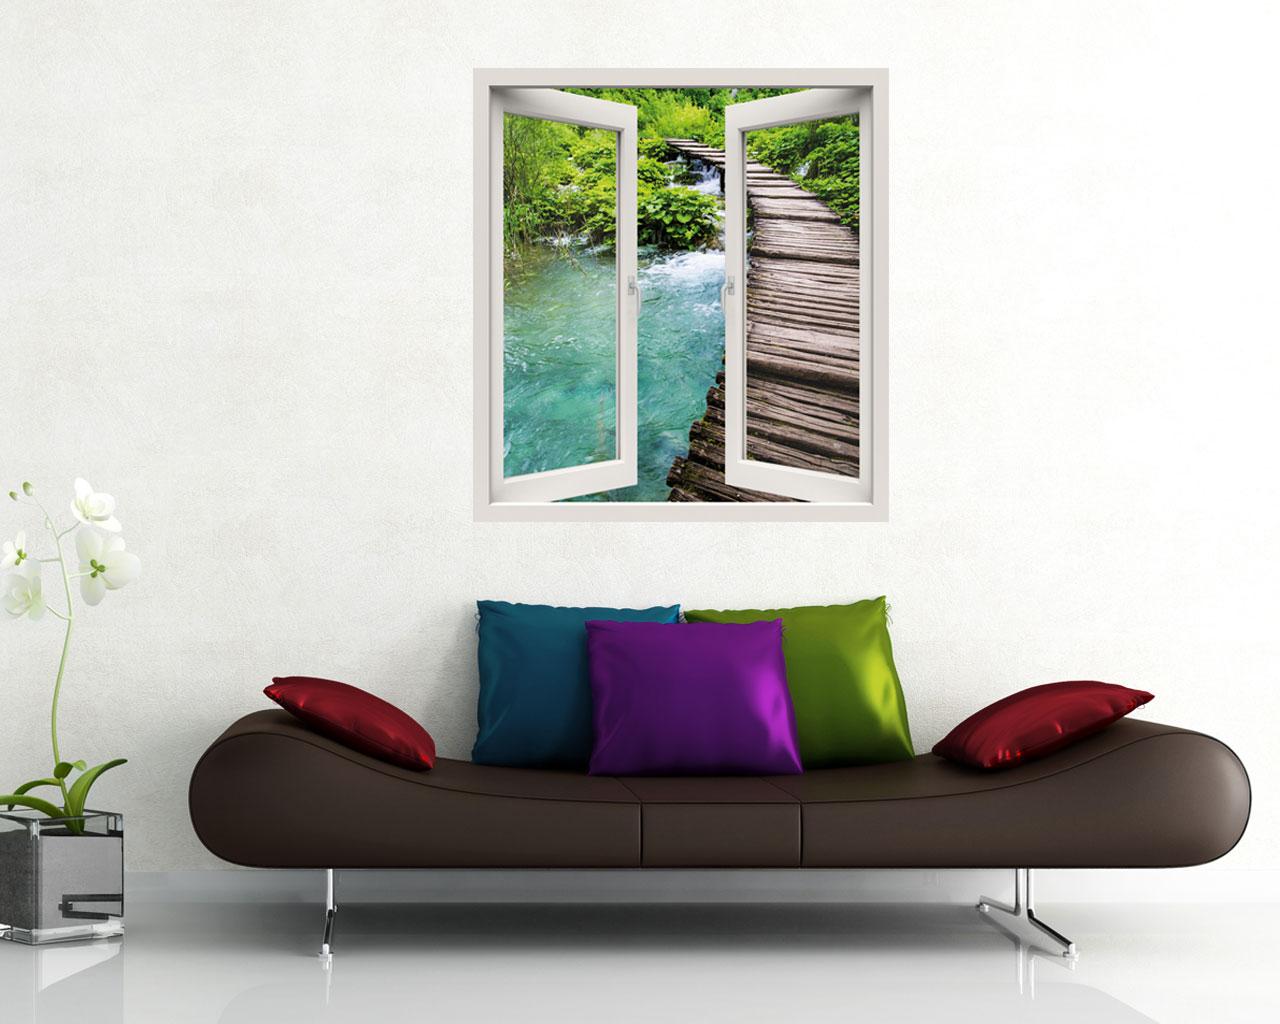 Scorcio sul torrente natura finestra illusione - La valigia sul letto torrent ...